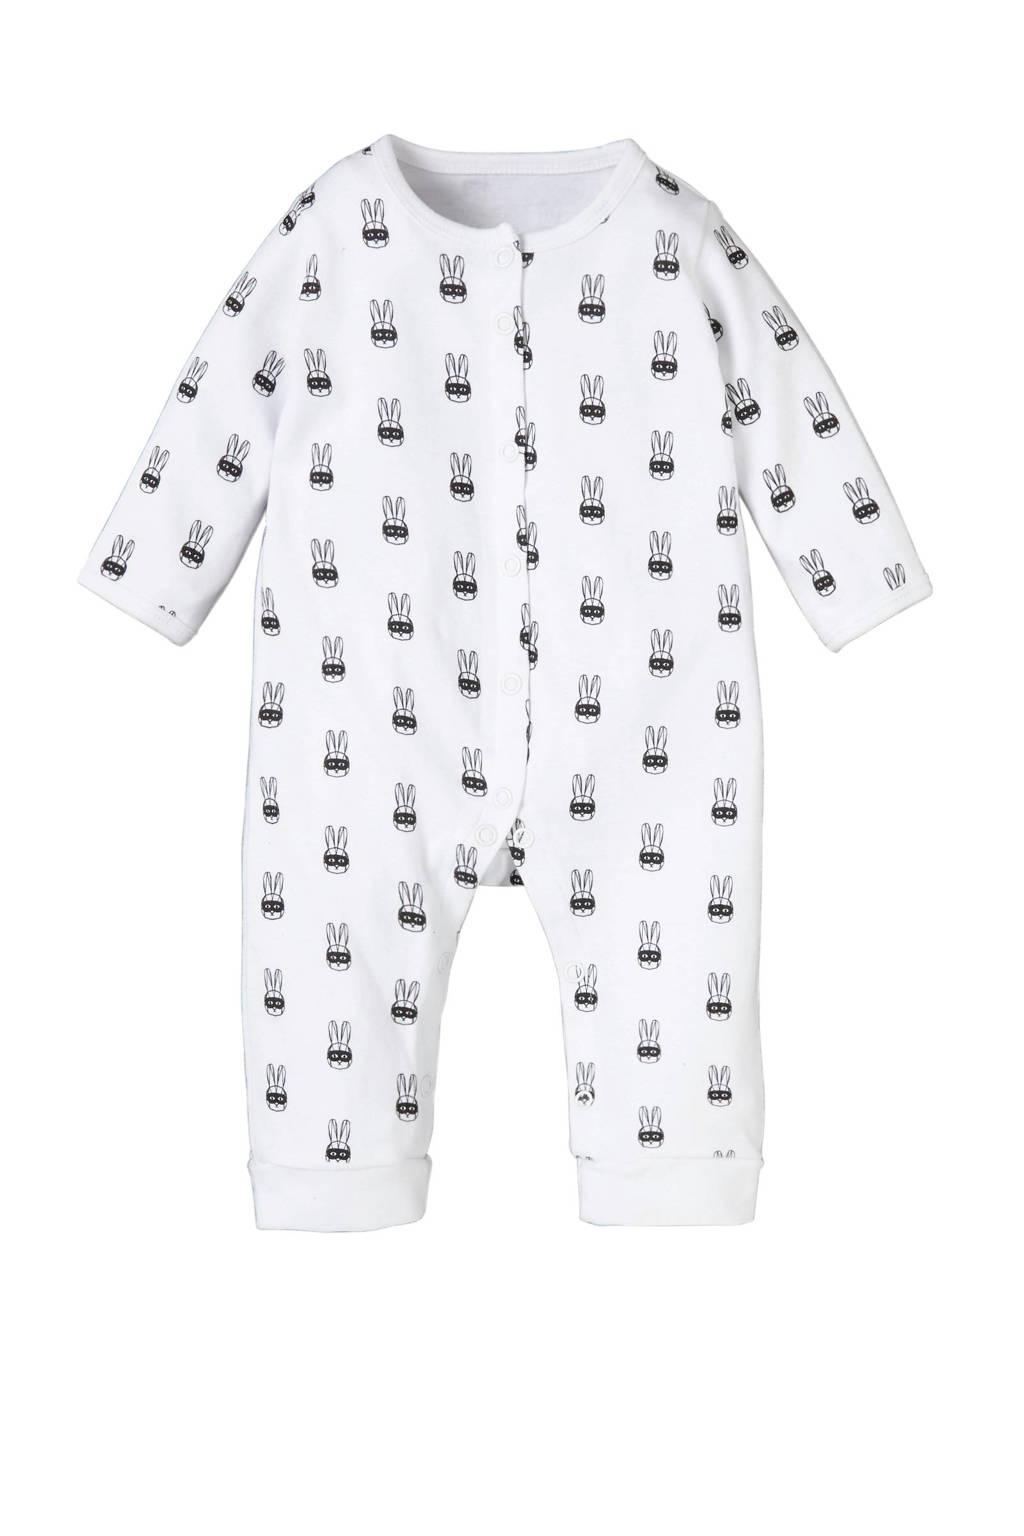 4PRESIDENT baby boxpak Roman met all over print wit, Wit